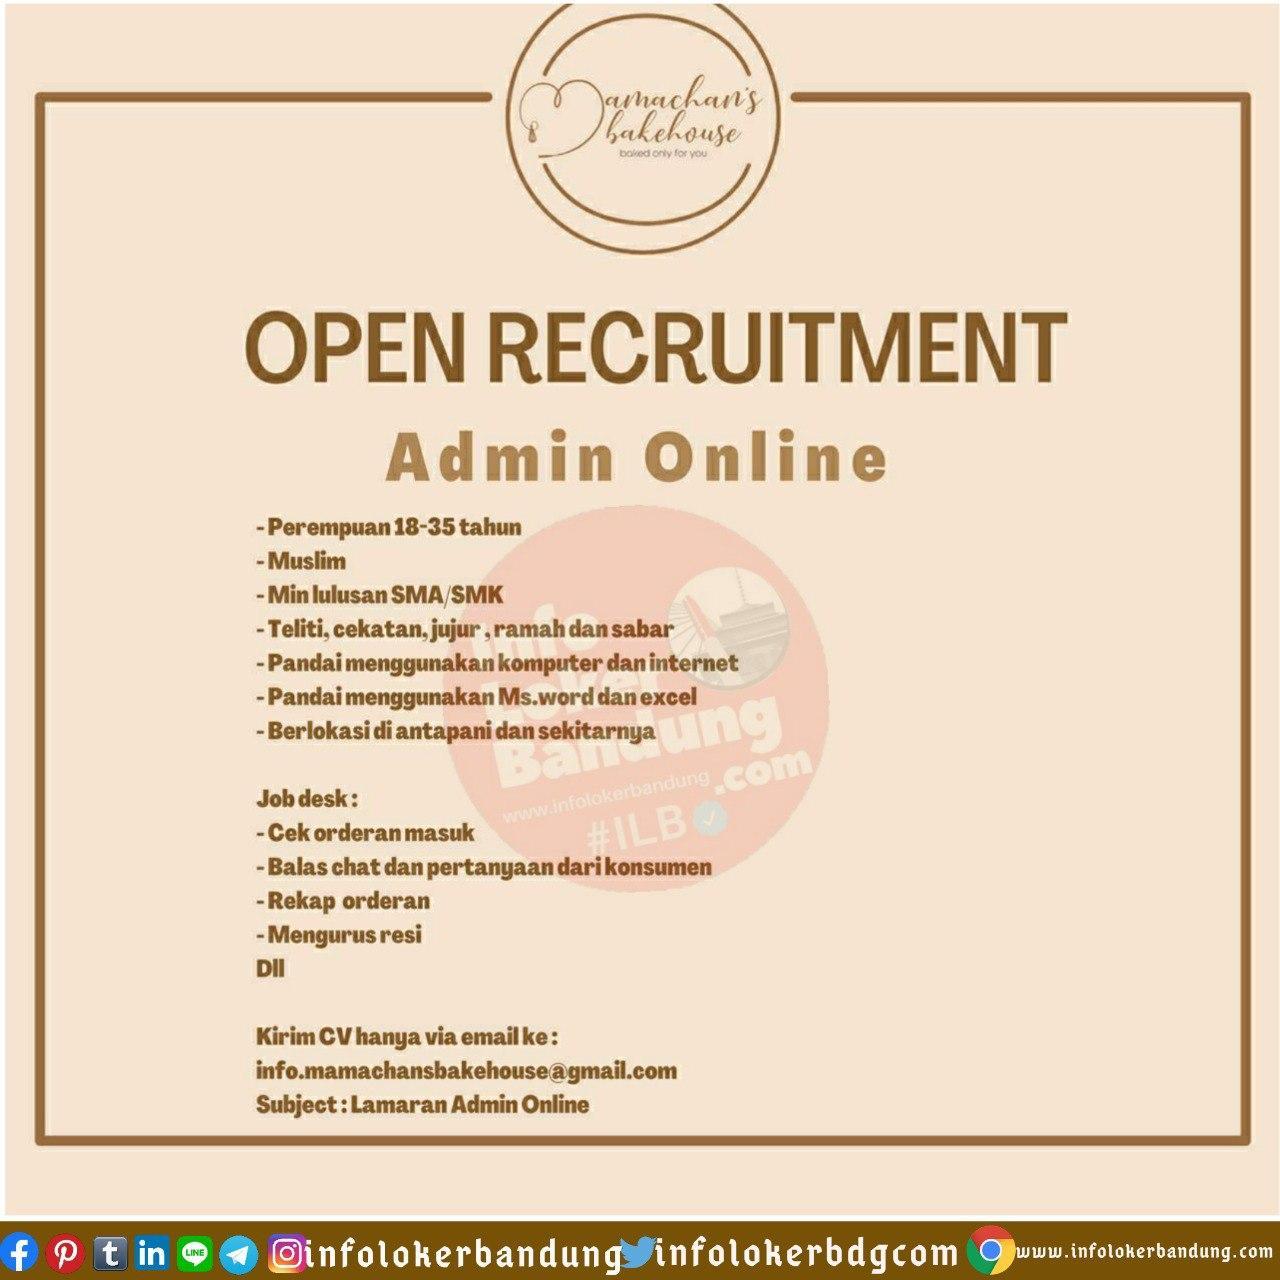 Lowongan Kerja Admin Online Mamachans Bakehouse Bandung Juli 2020